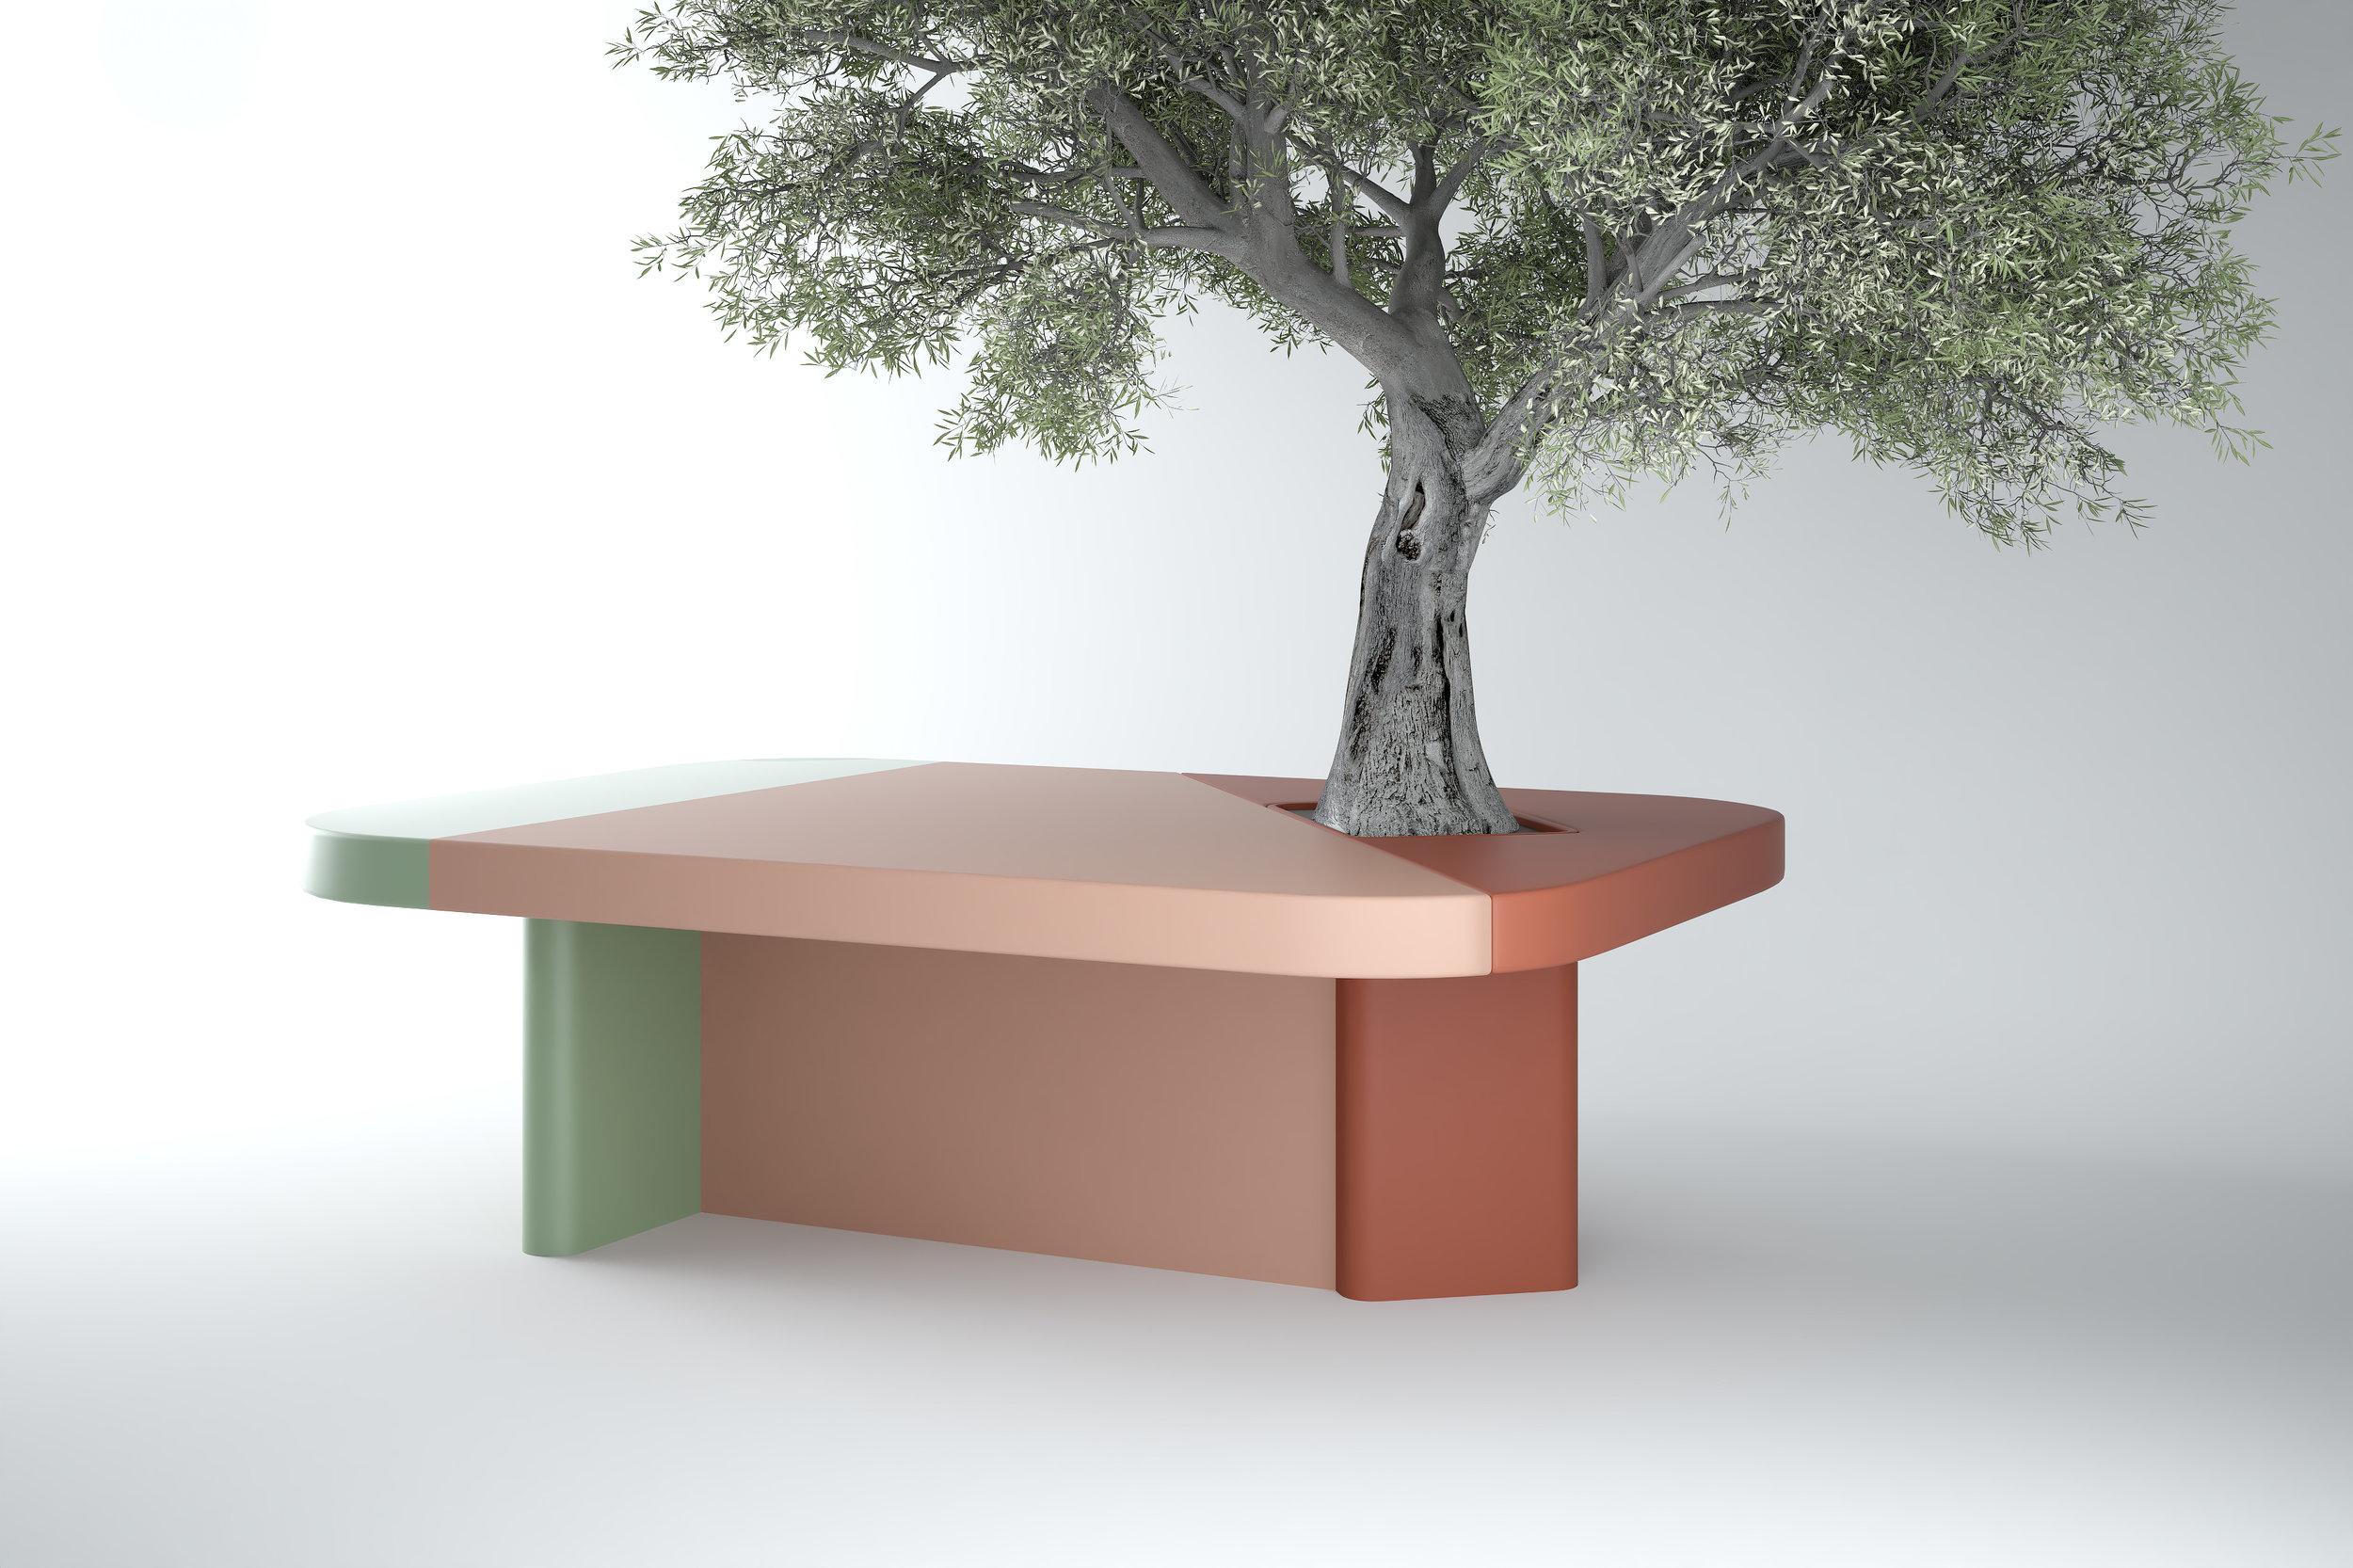 180530_tree table view02.jpg